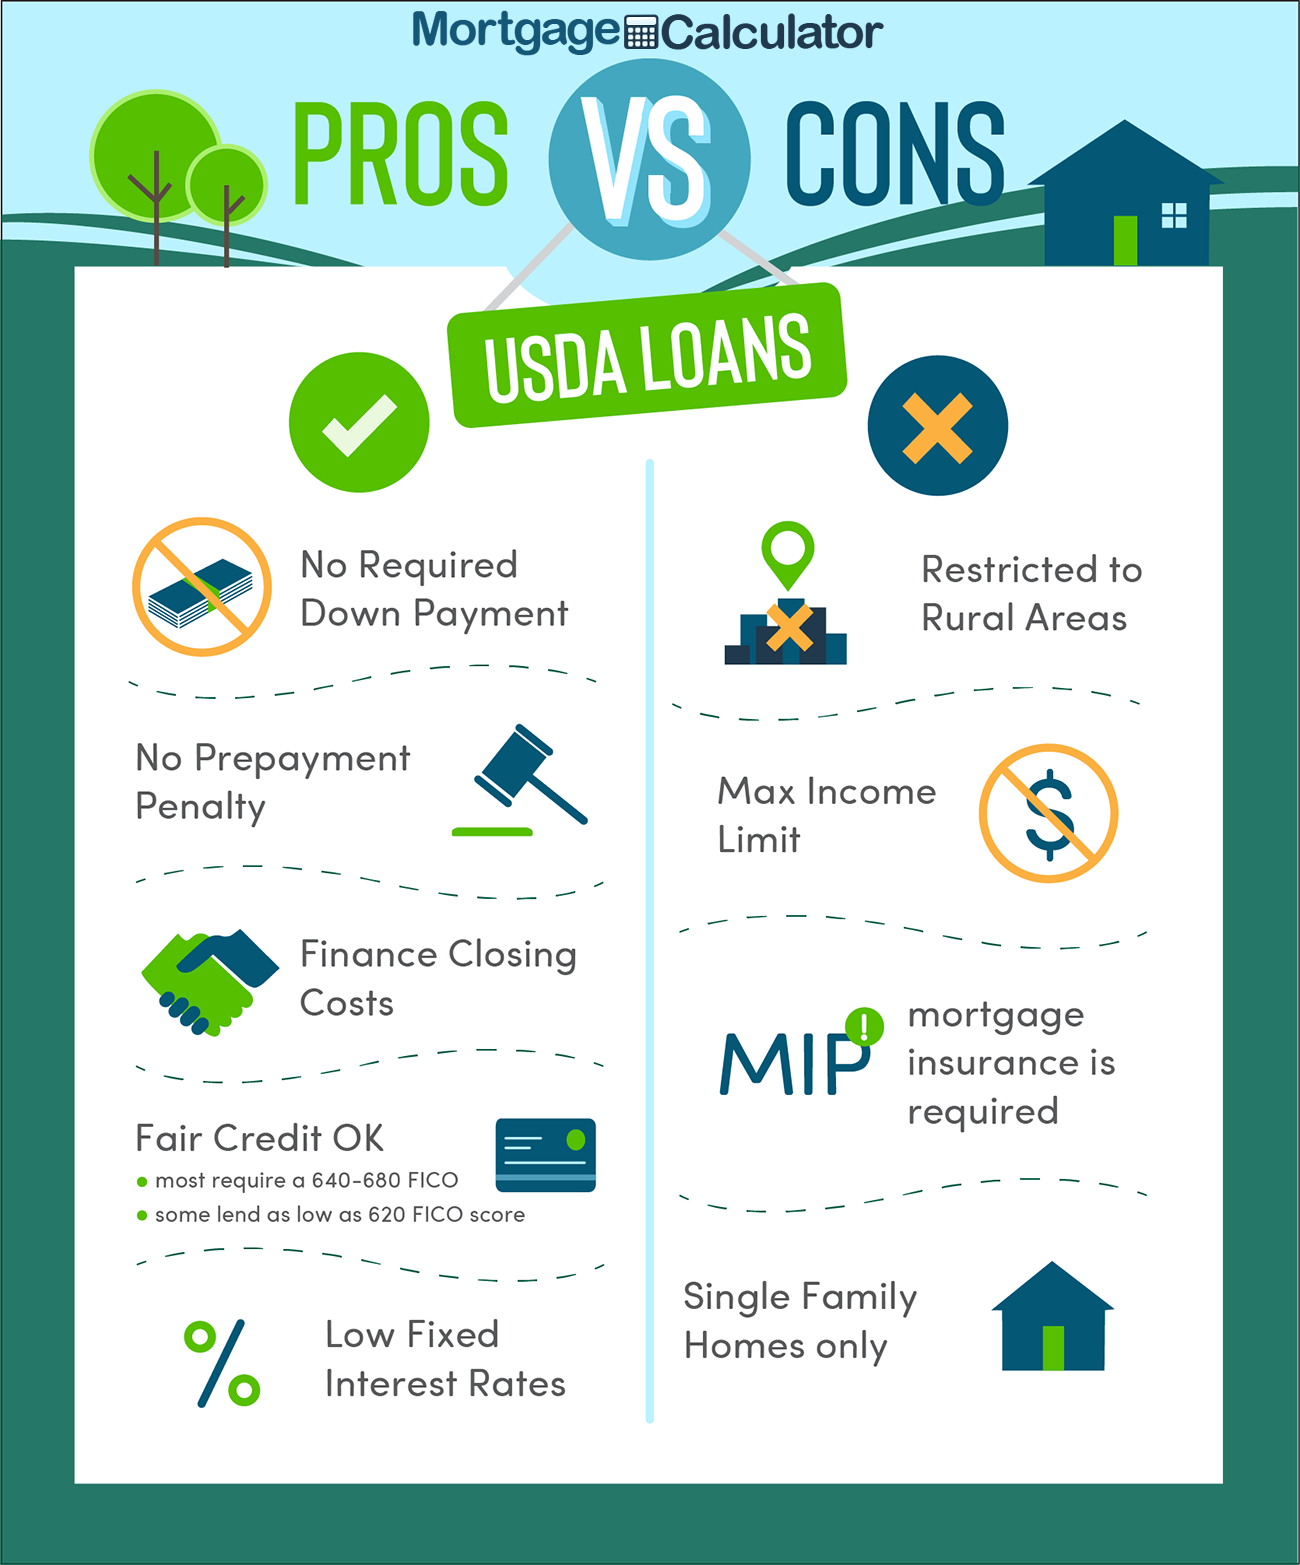 Usda Loan Pros And Cons In 2020 Usda Loan Loan